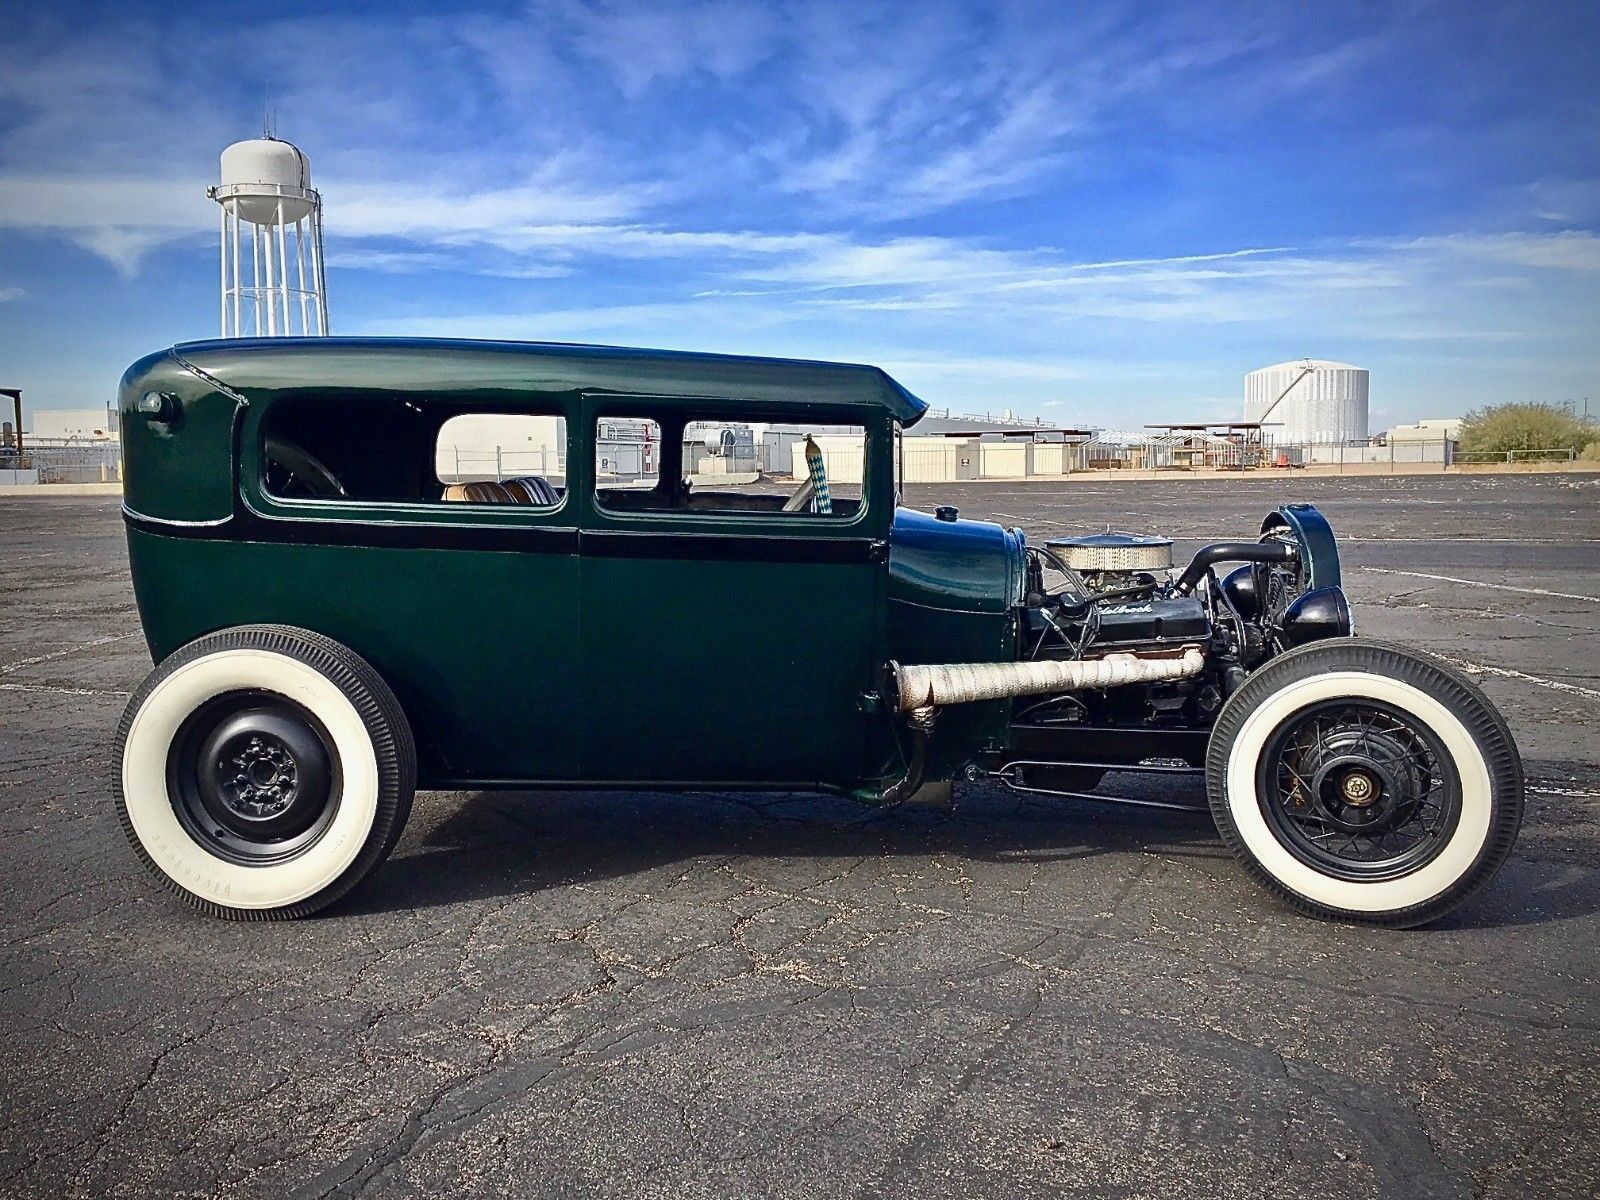 Awesome Amazing 1929 Ford Model A 1929 Ford Model A Sedan Hot Rod ...